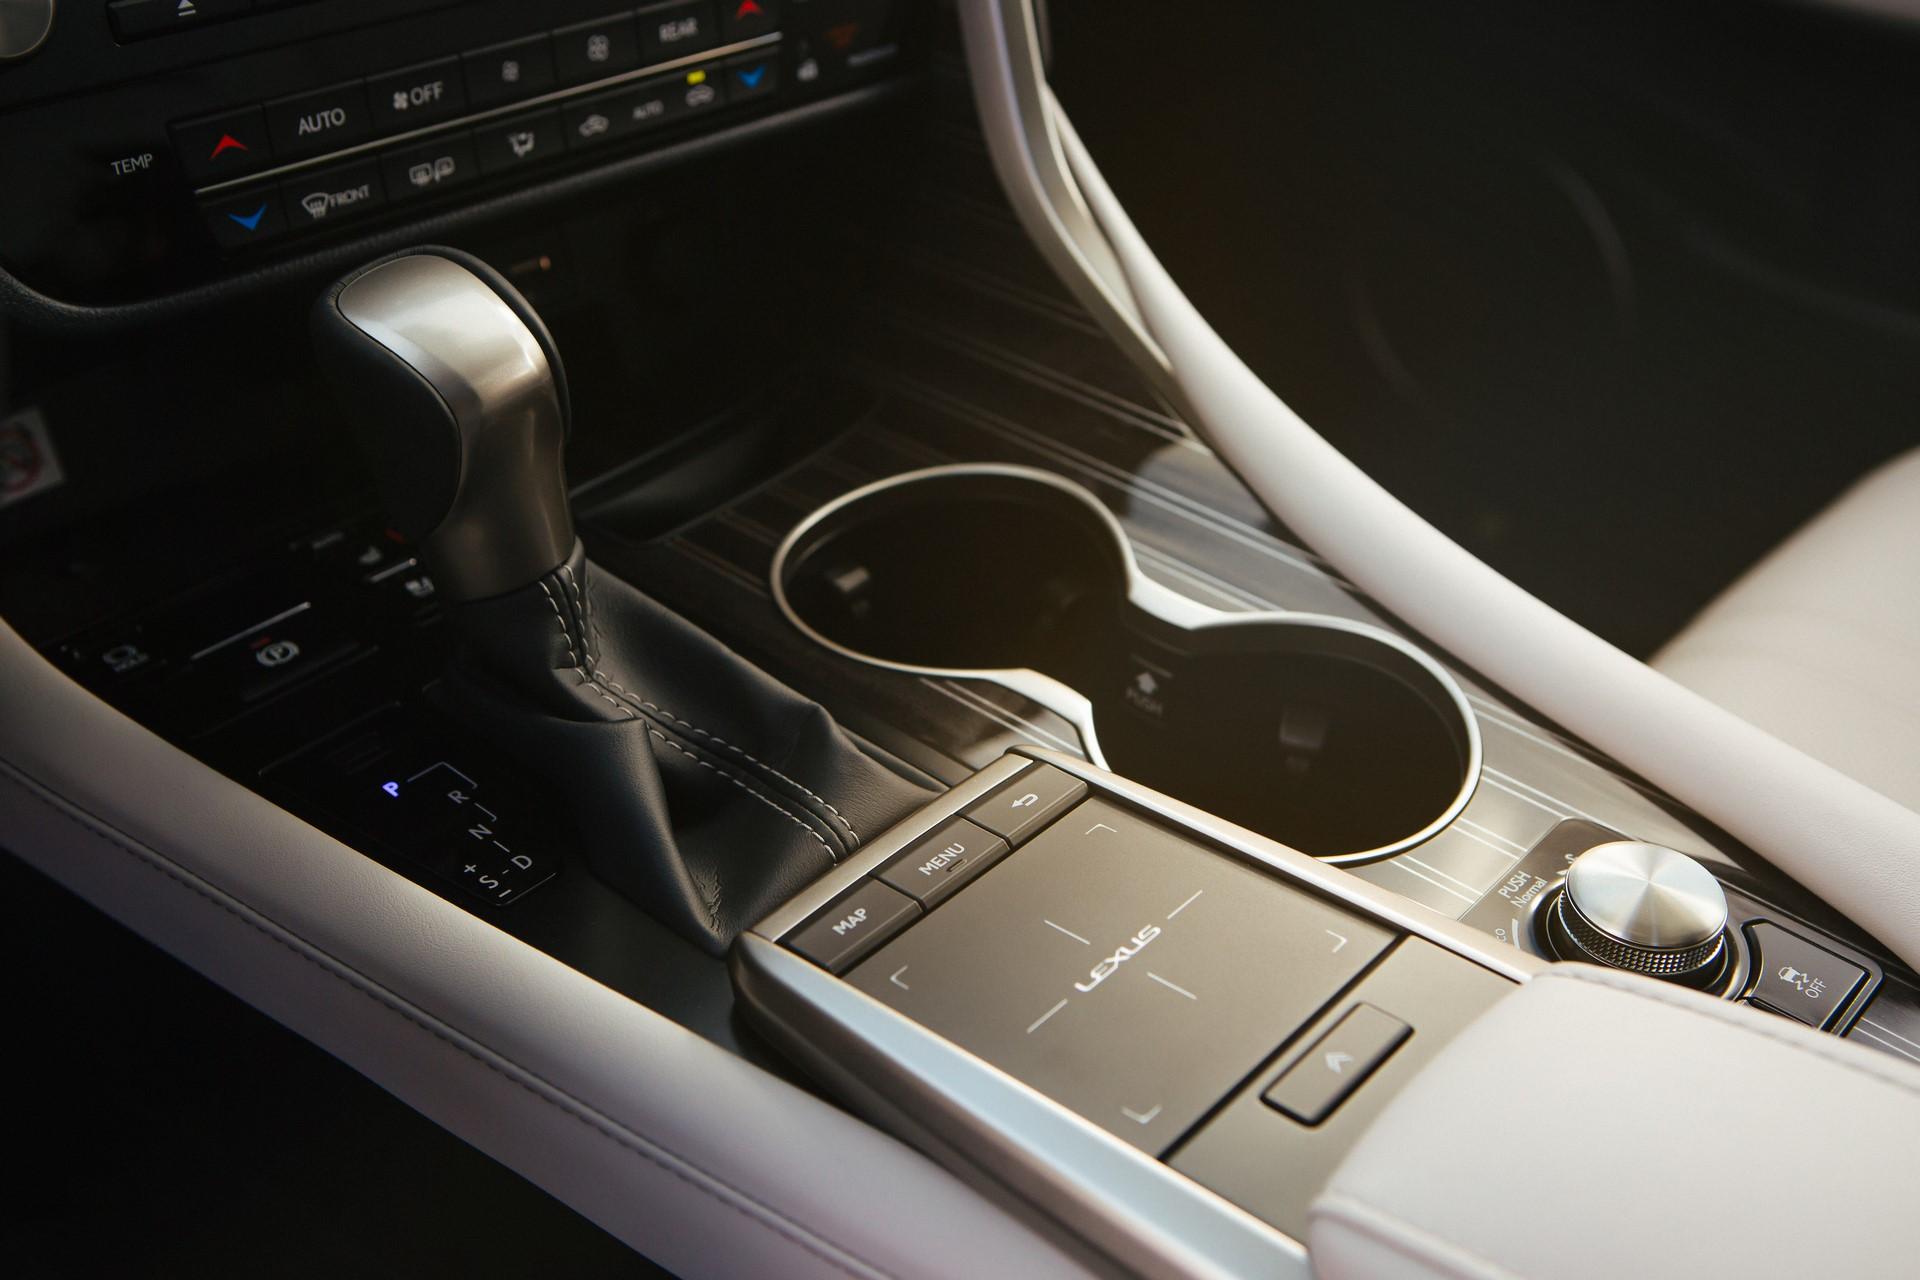 2020_Lexus_RX_450hL_16_0BC25A96F8C13A59D5201AD12FB94E9F10BC0F45